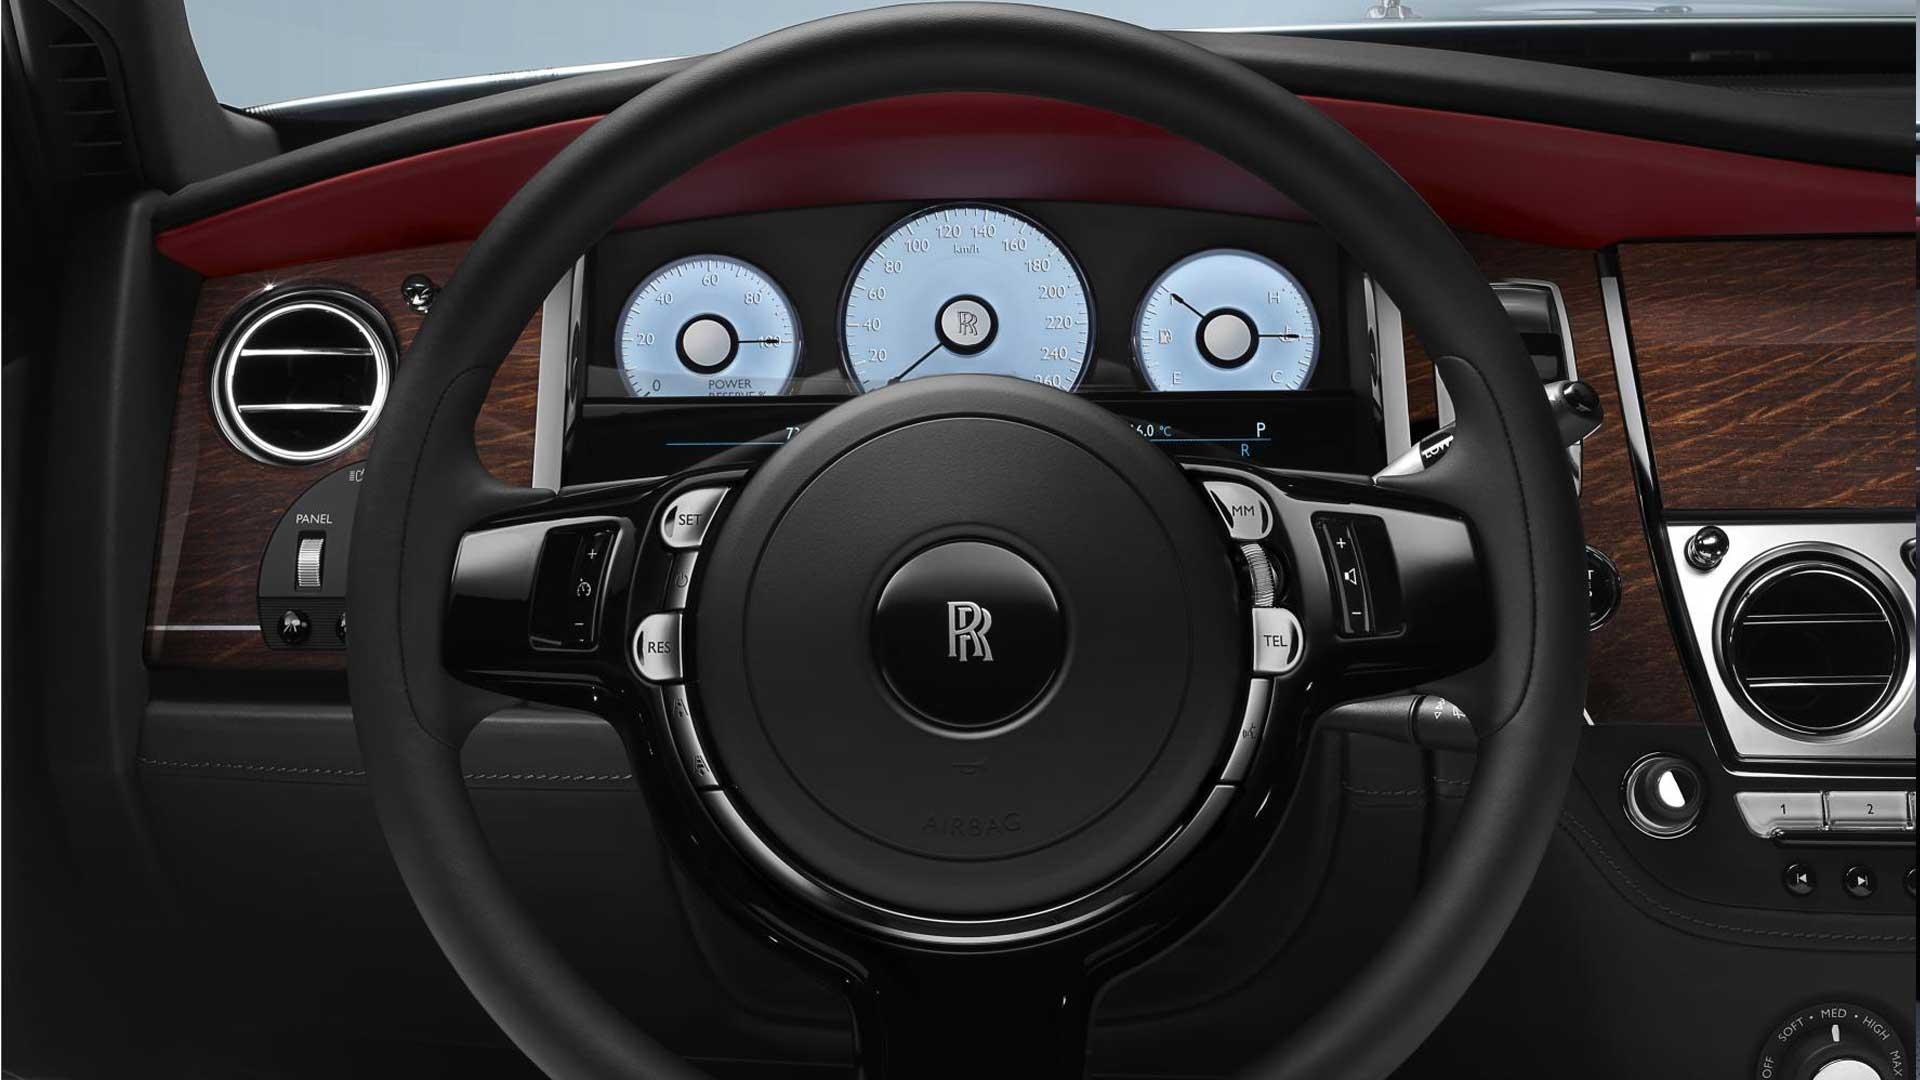 Rolls Royce Ghost Series Ii 2014 Ewb Interior Car Photos Overdrive